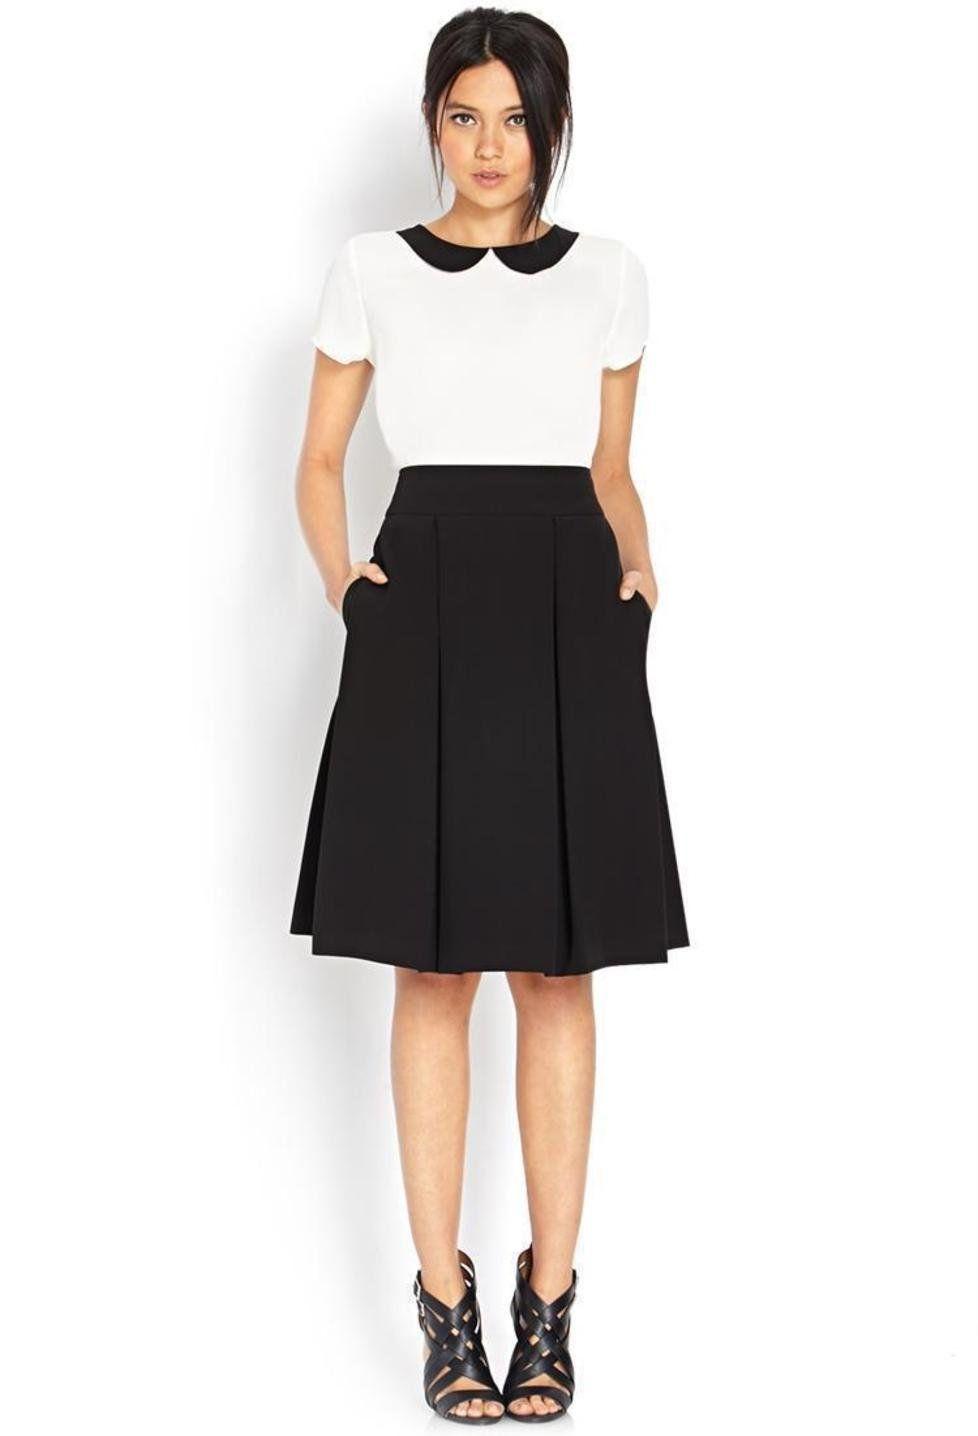 Bildresultat för black midi skirt | Goal Outfit | Pinterest ...